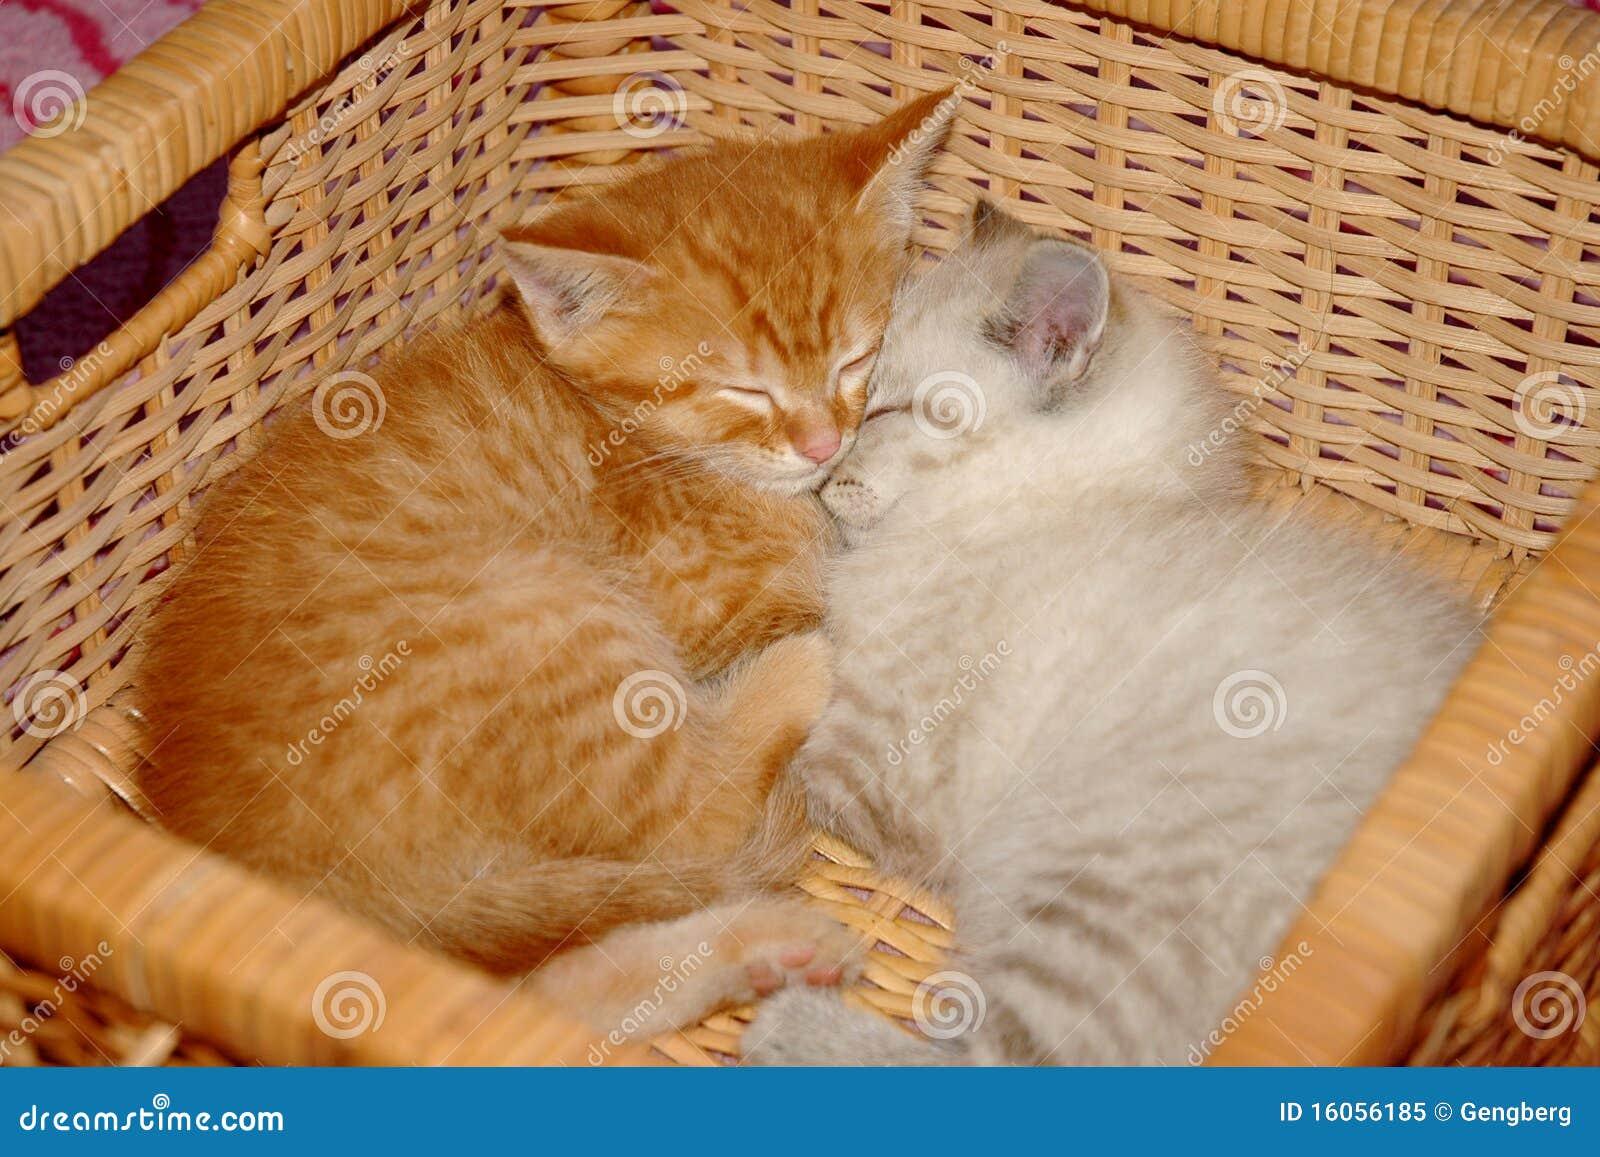 Kittens Basket Royalty Free Stock Photo - Image: 16056185